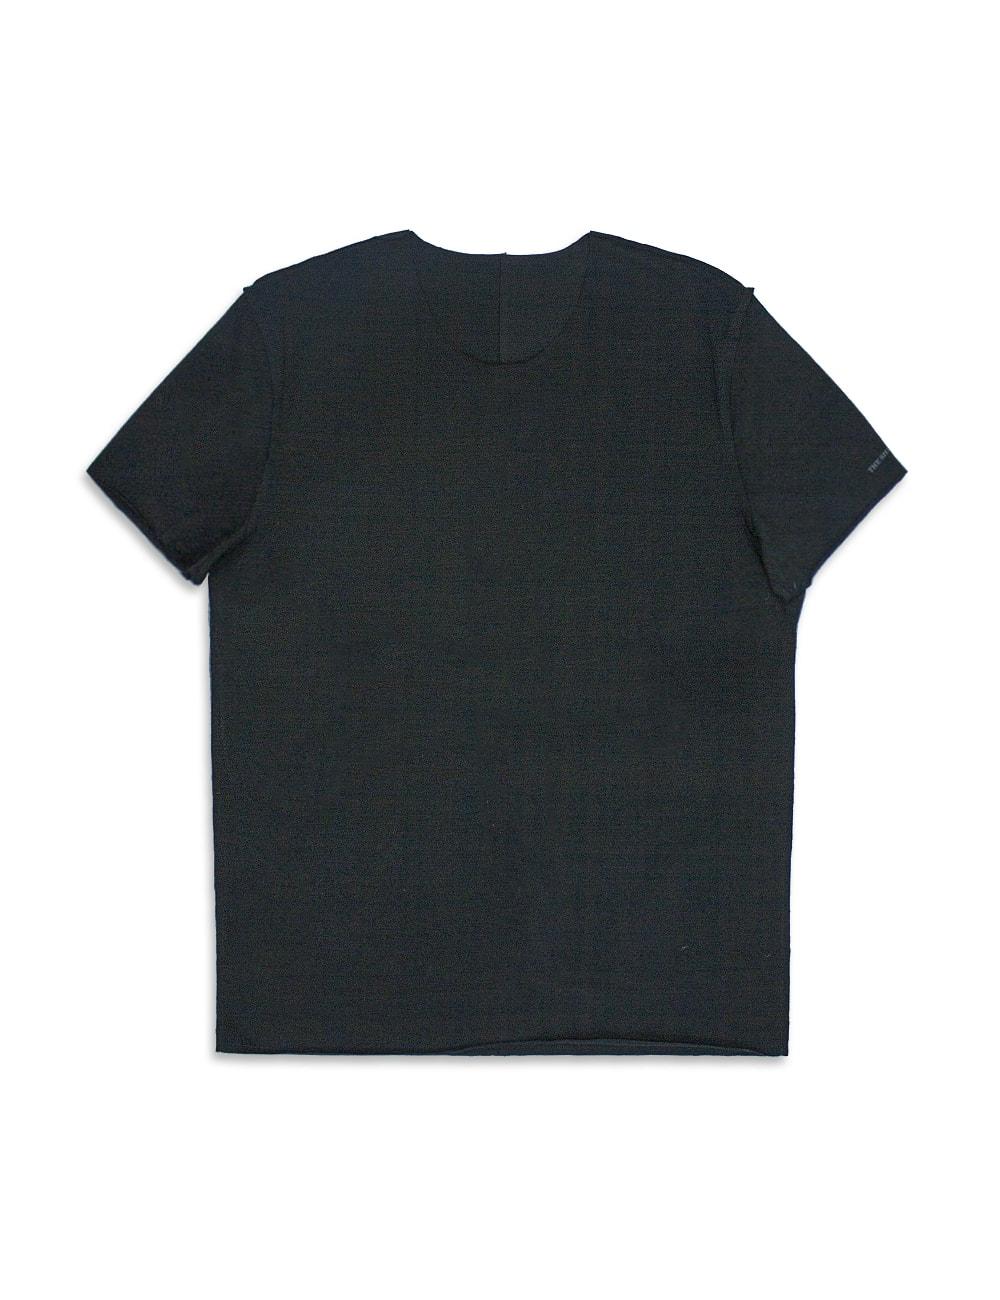 Comfort Fit Black Premium Cotton Stretch Raw Edge Short Sleeve T-shirt - TS2A1.2